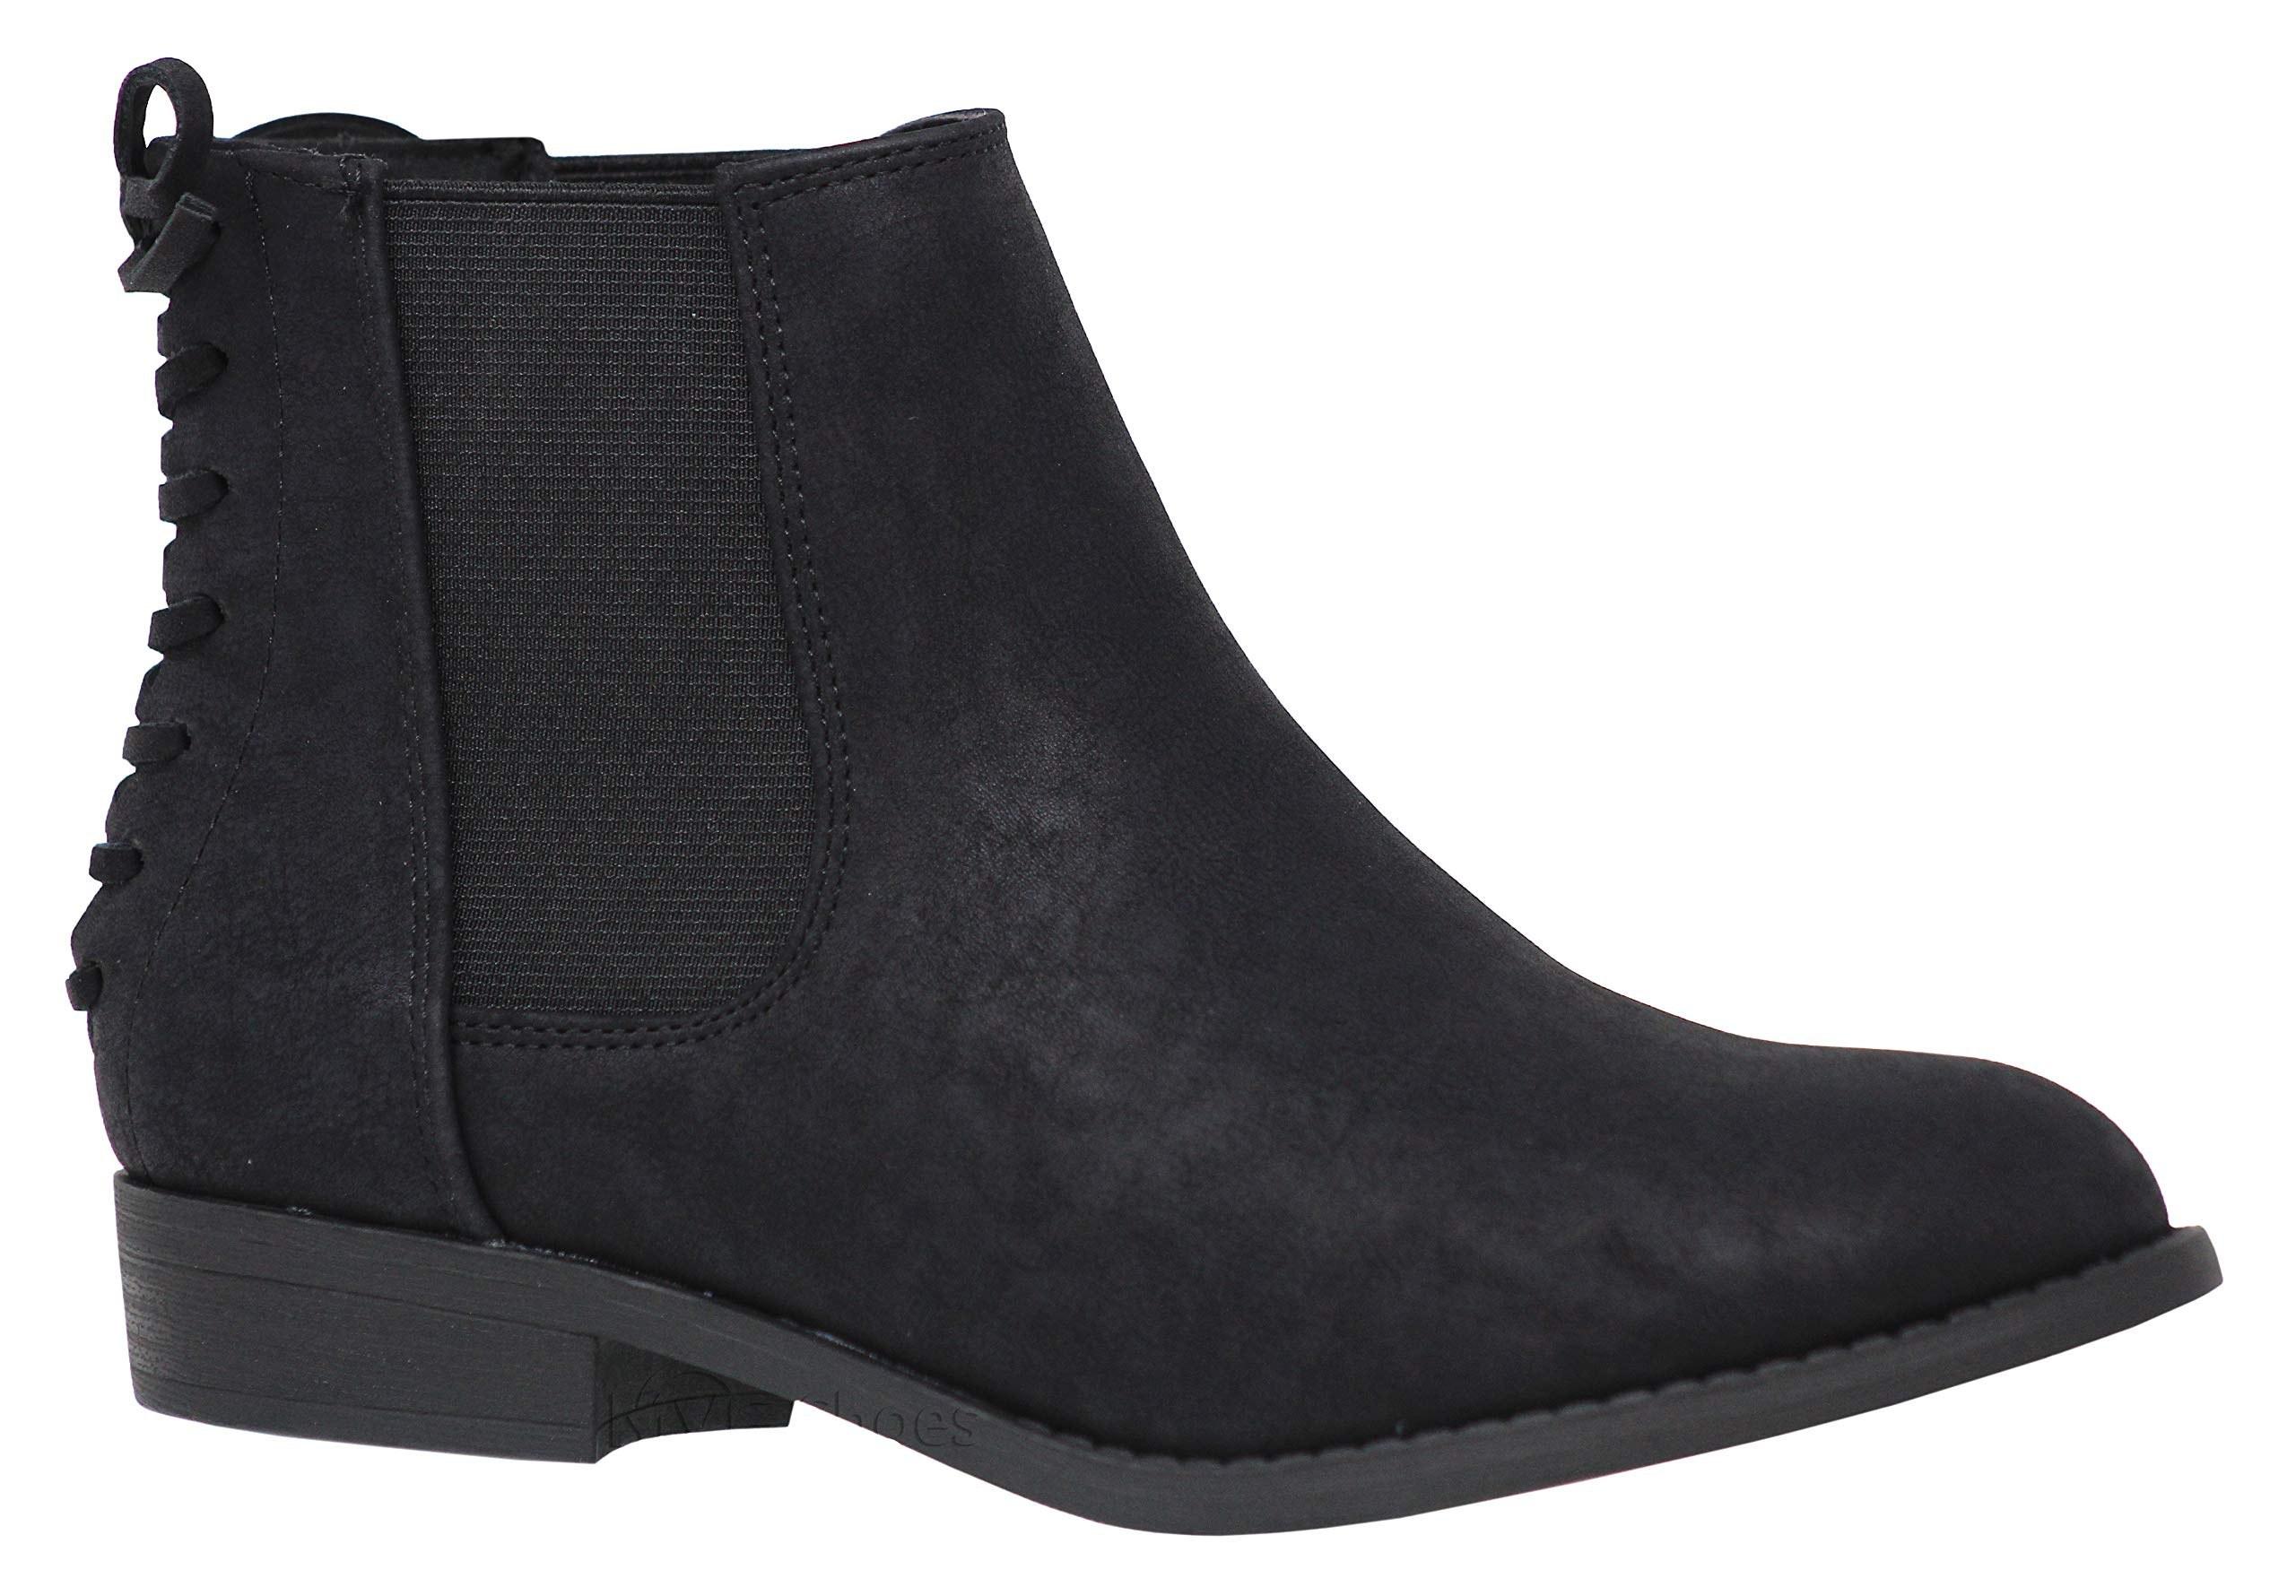 LIURUIJIA Womens Elastic Short Rain Boots Waterproof Low Heel Elastic Slip On Ankel Chelsea Booties LYDX-12268-28